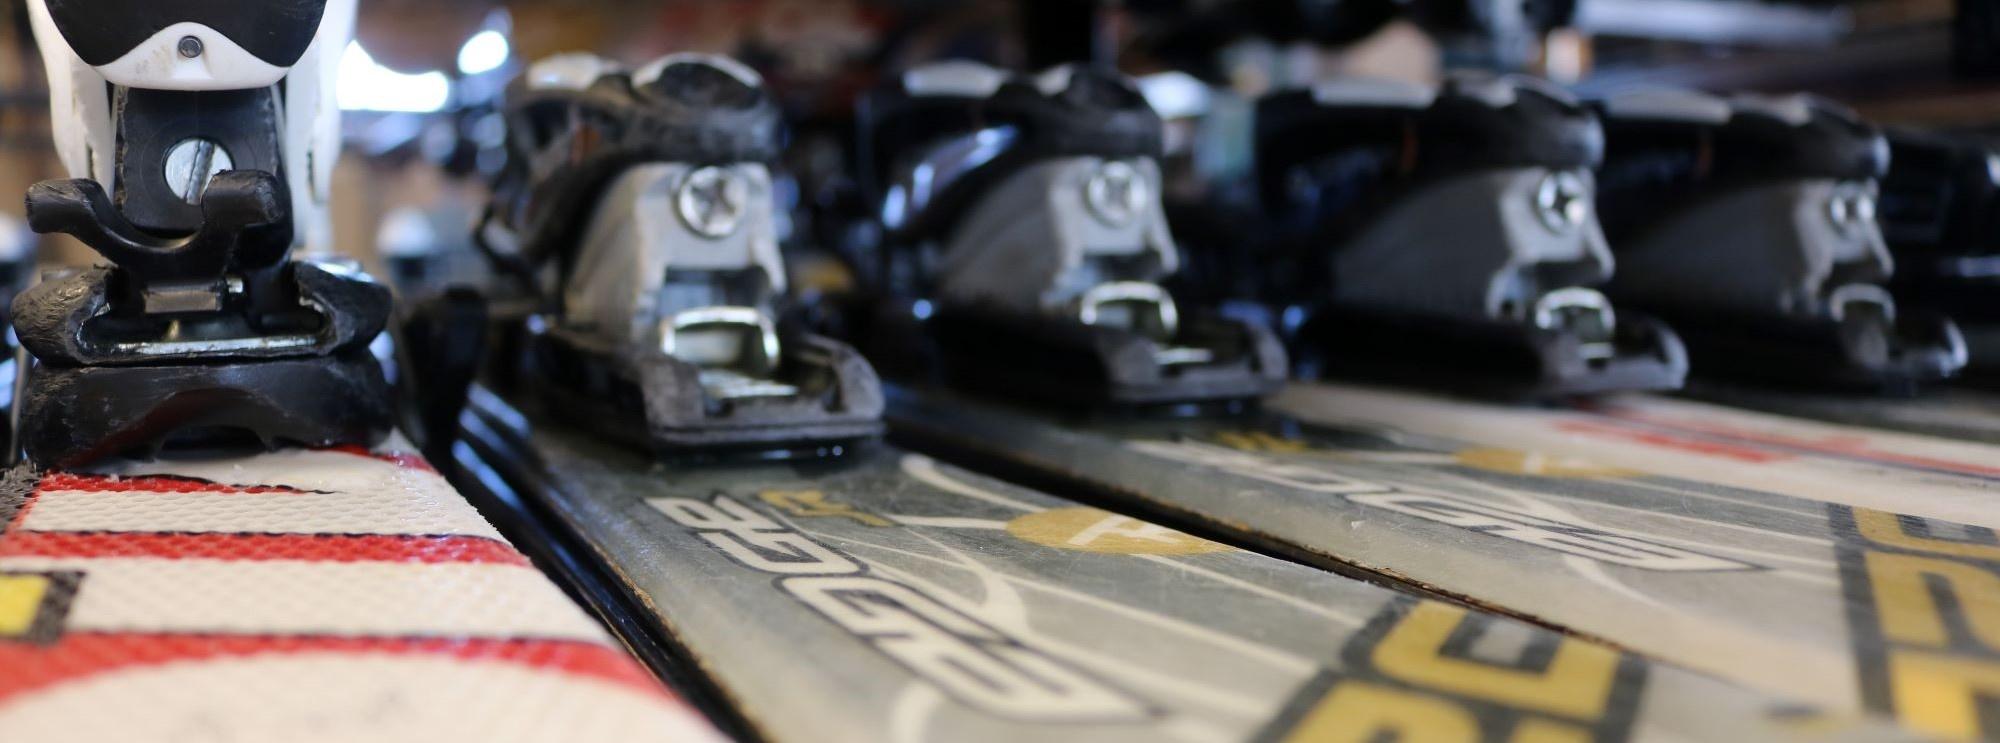 Rental Skis on a Rack